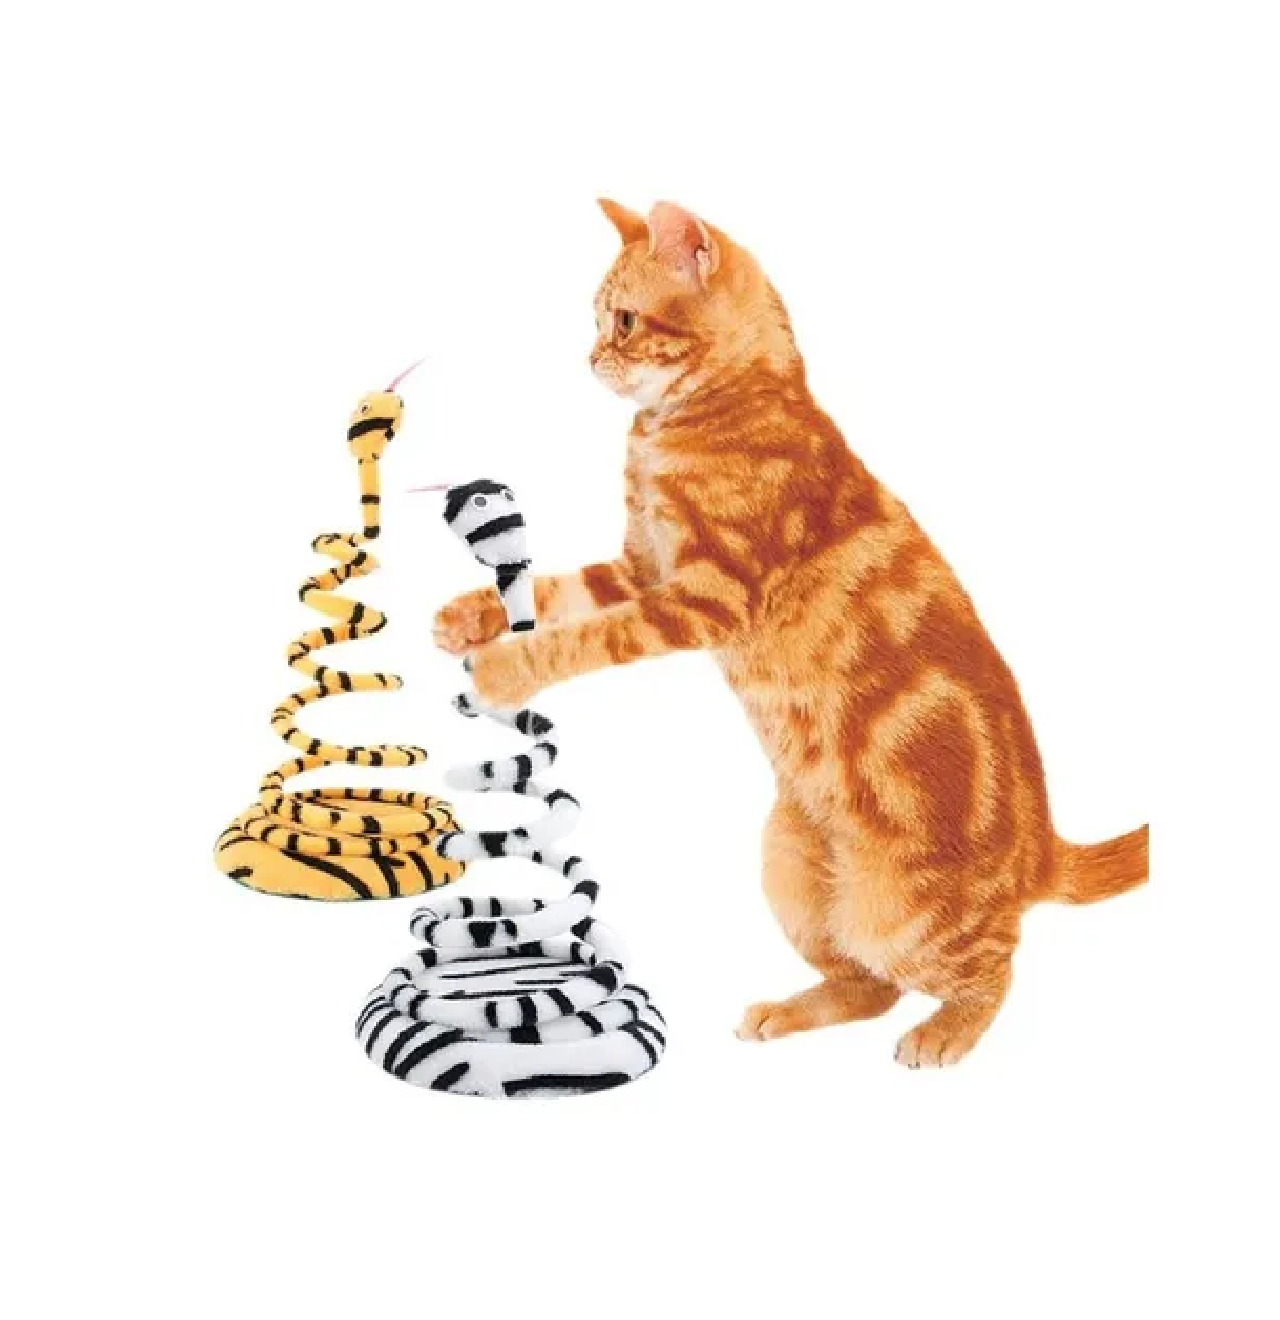 Brinquedo Joao Bobo Para Gatos - Chalesco